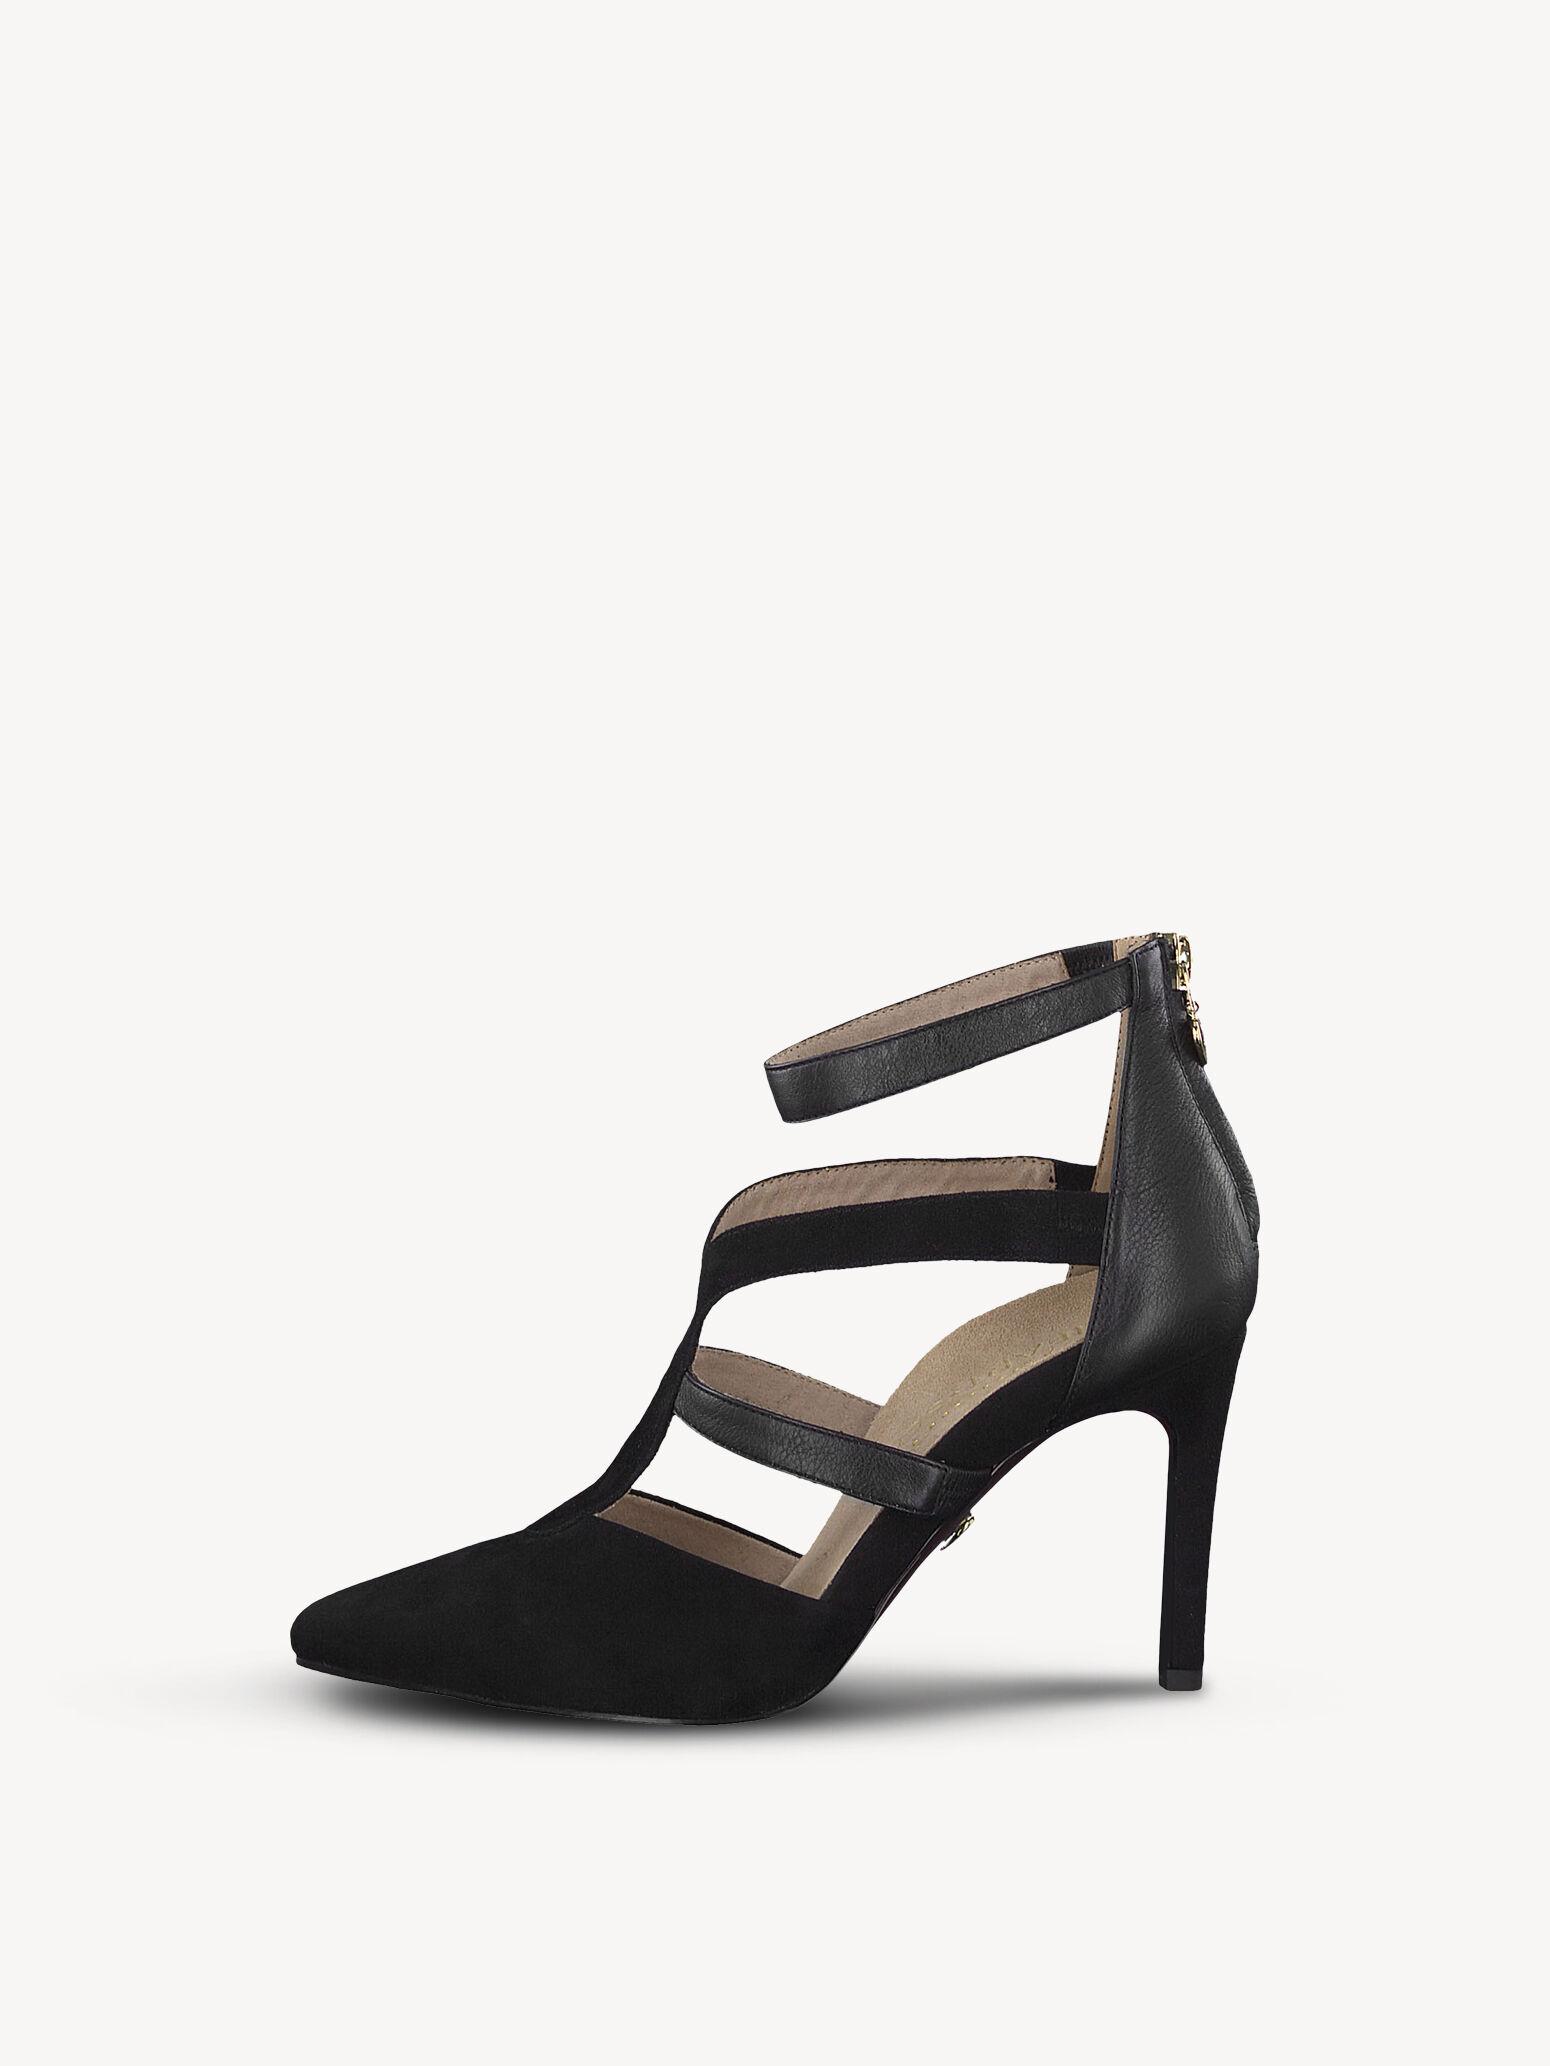 Tamaris chaussures femmes Talons hauts à commander